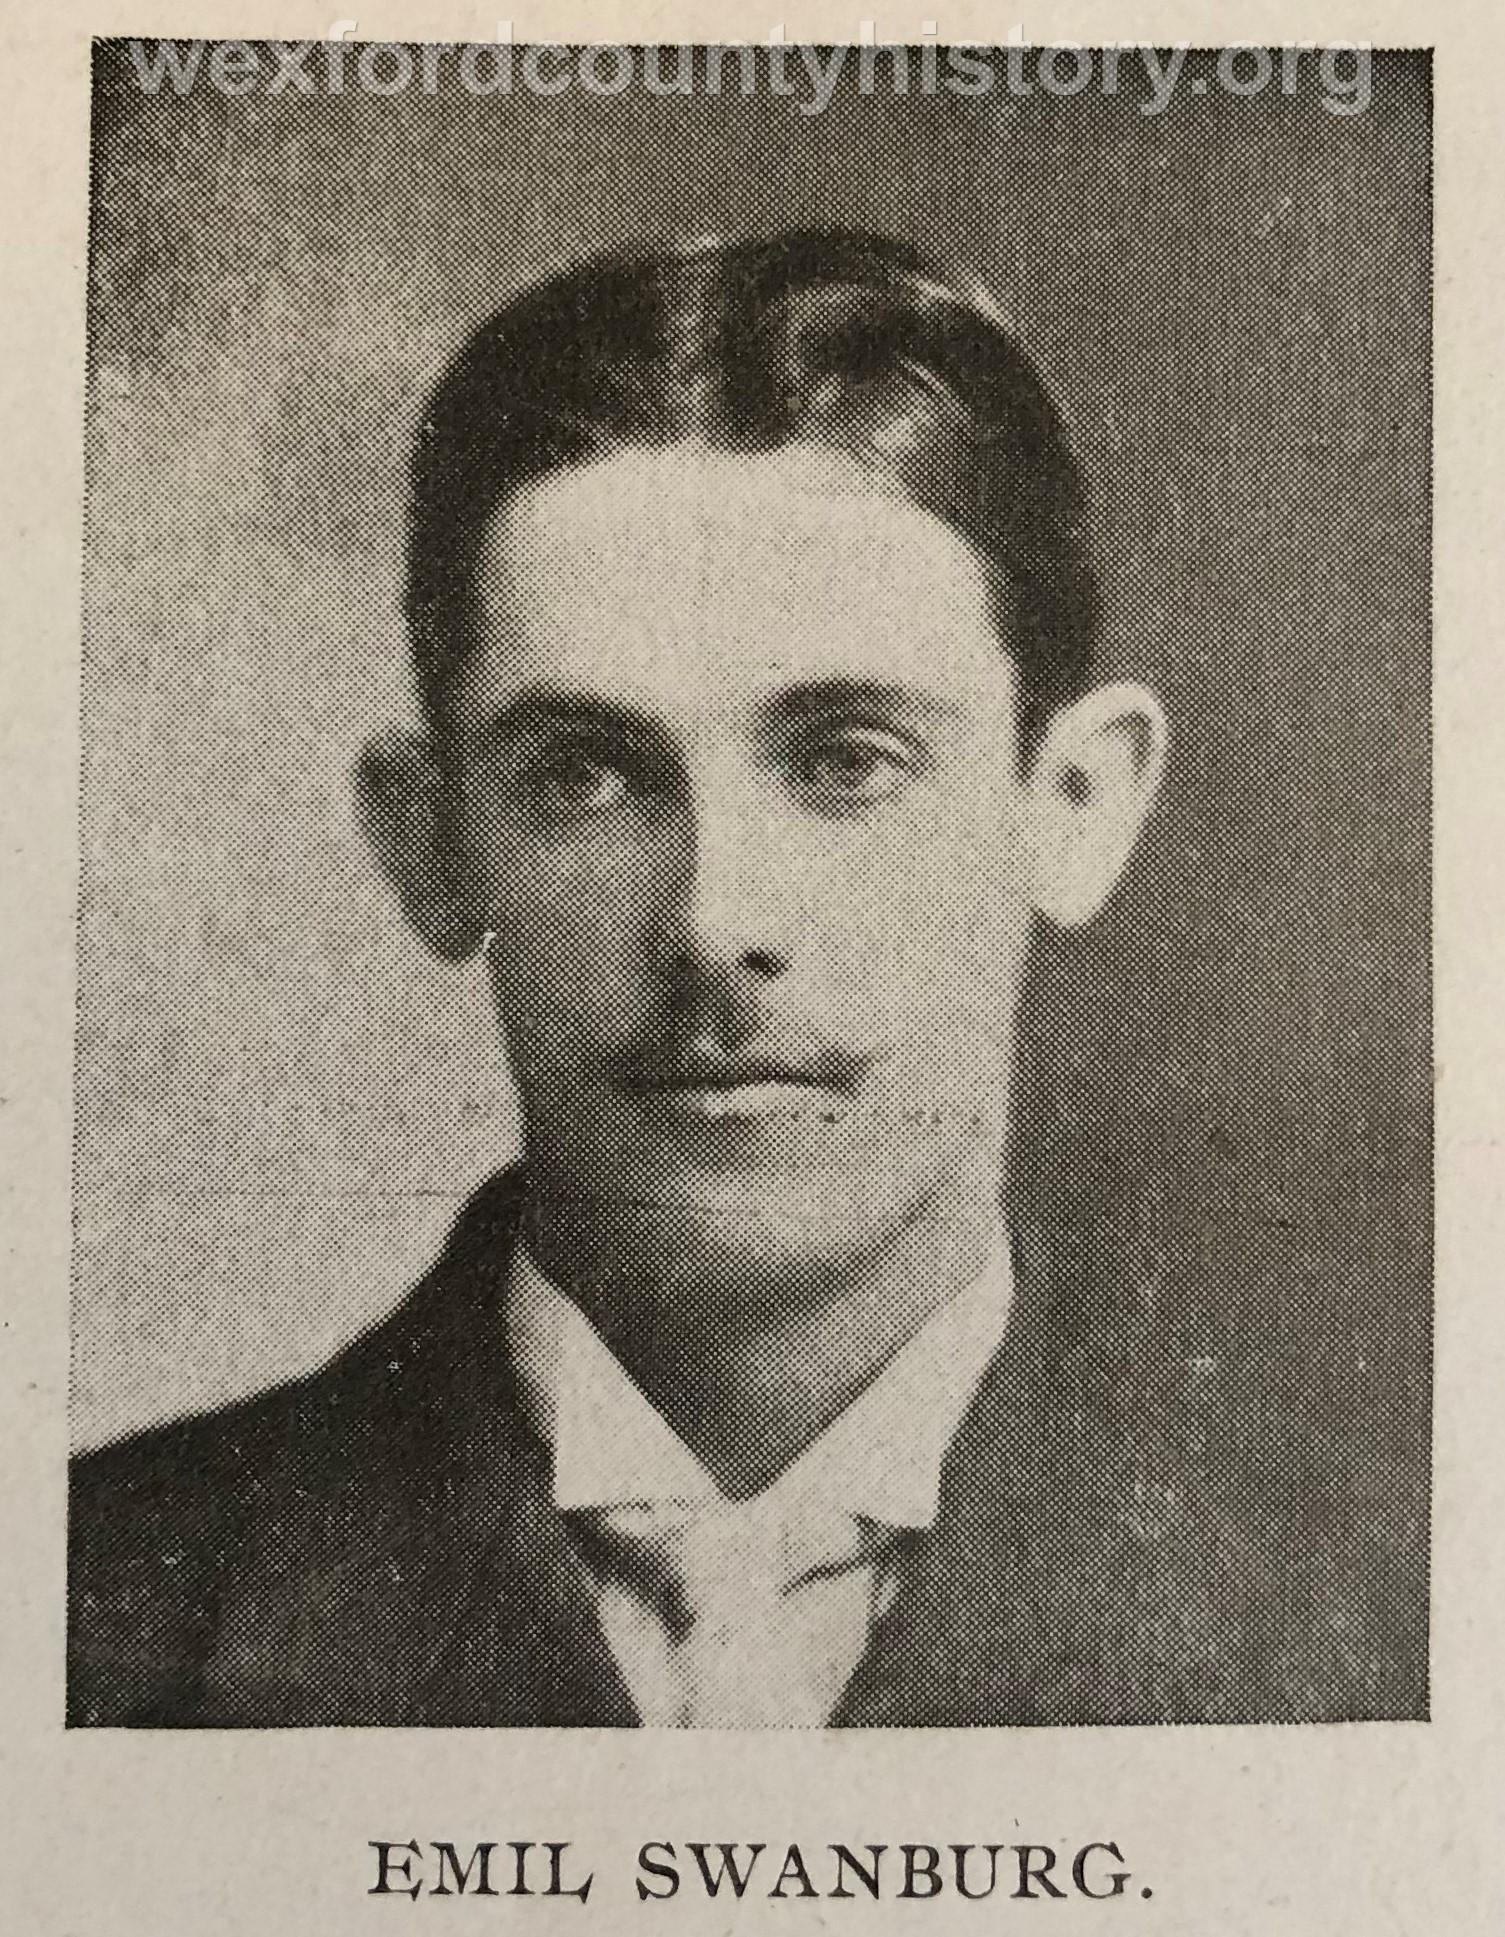 Emil Swanburg